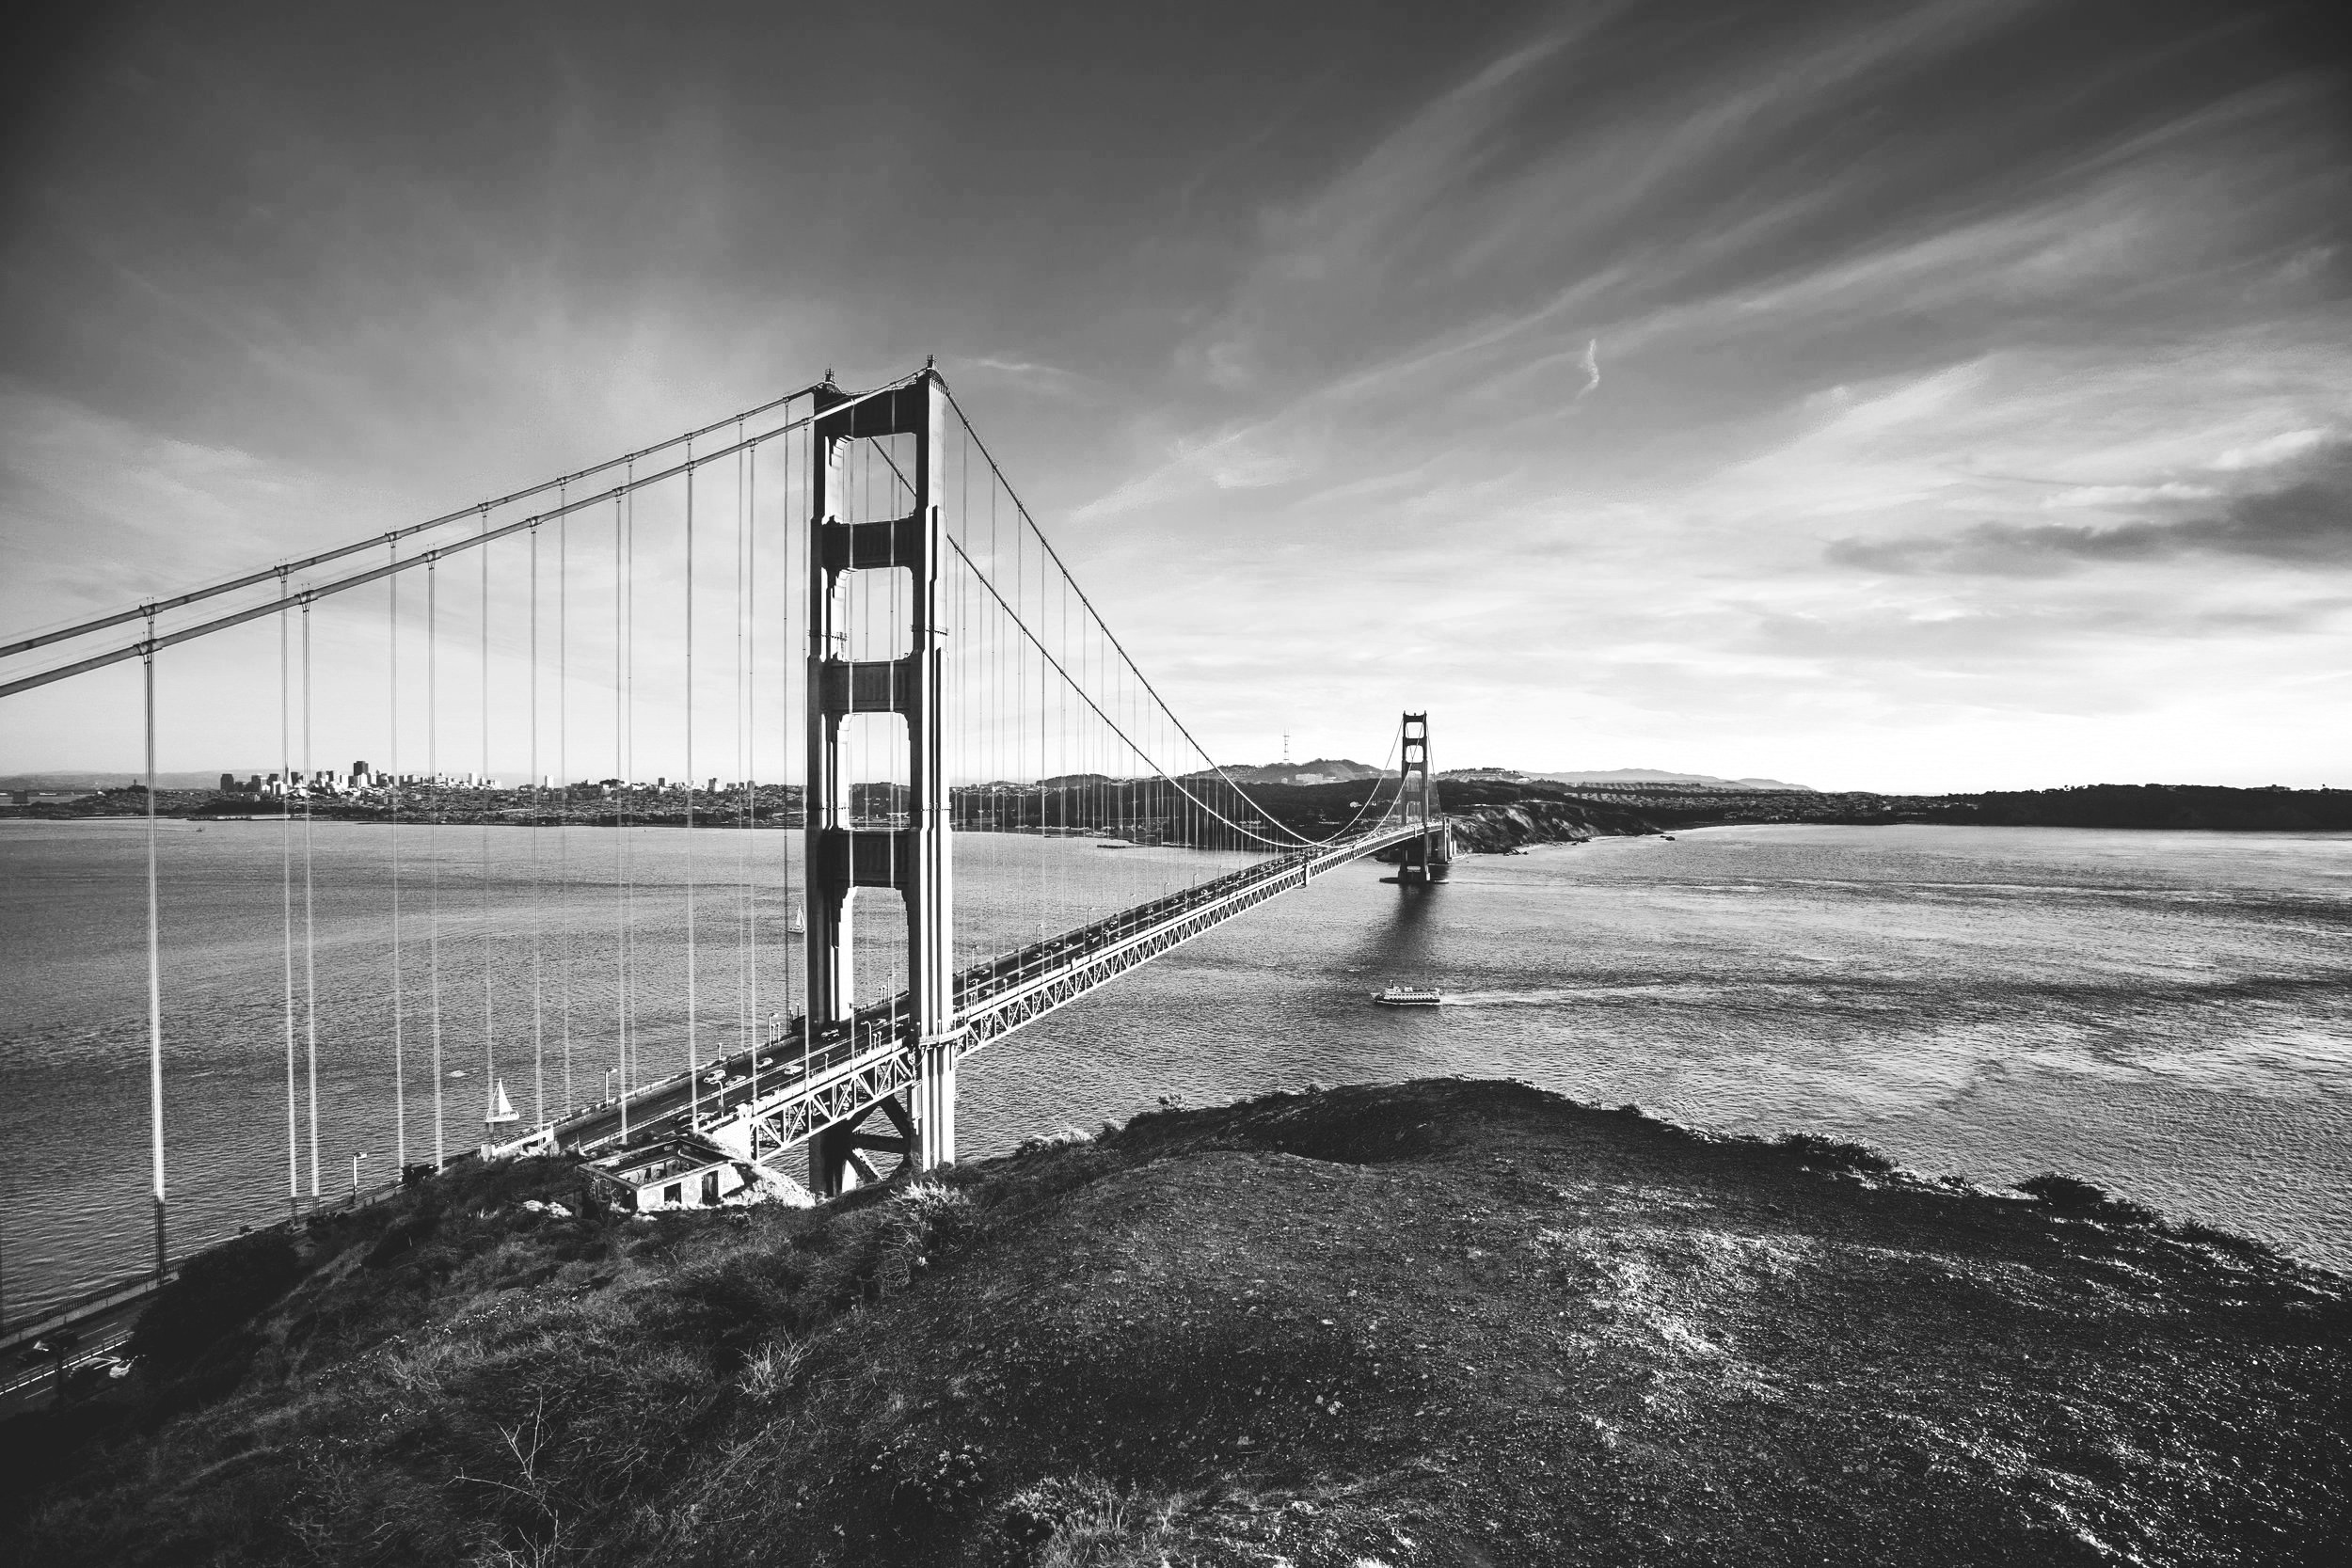 Image of the Golden Gate Bridge